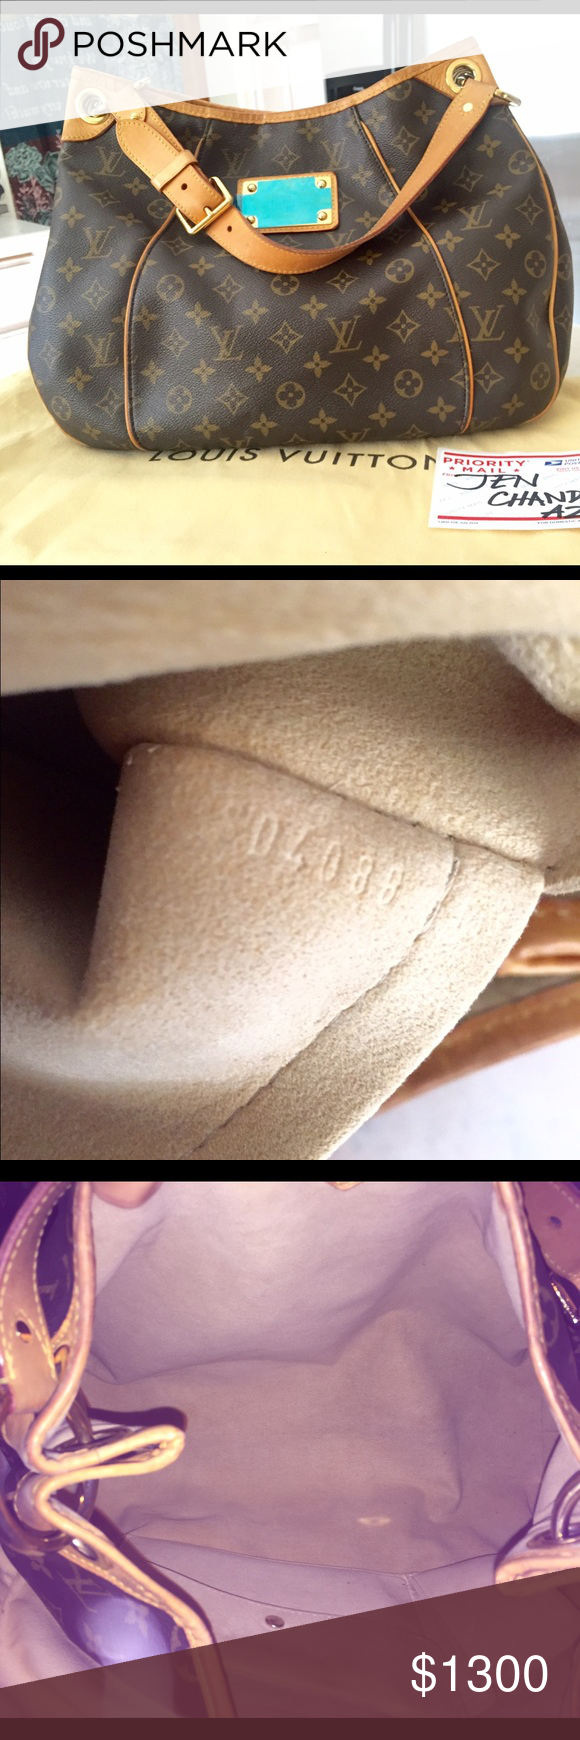 a84a04eca14 Authentic Galliera PM Louis Vuitton Monogram Date code SD 4088 Made ...